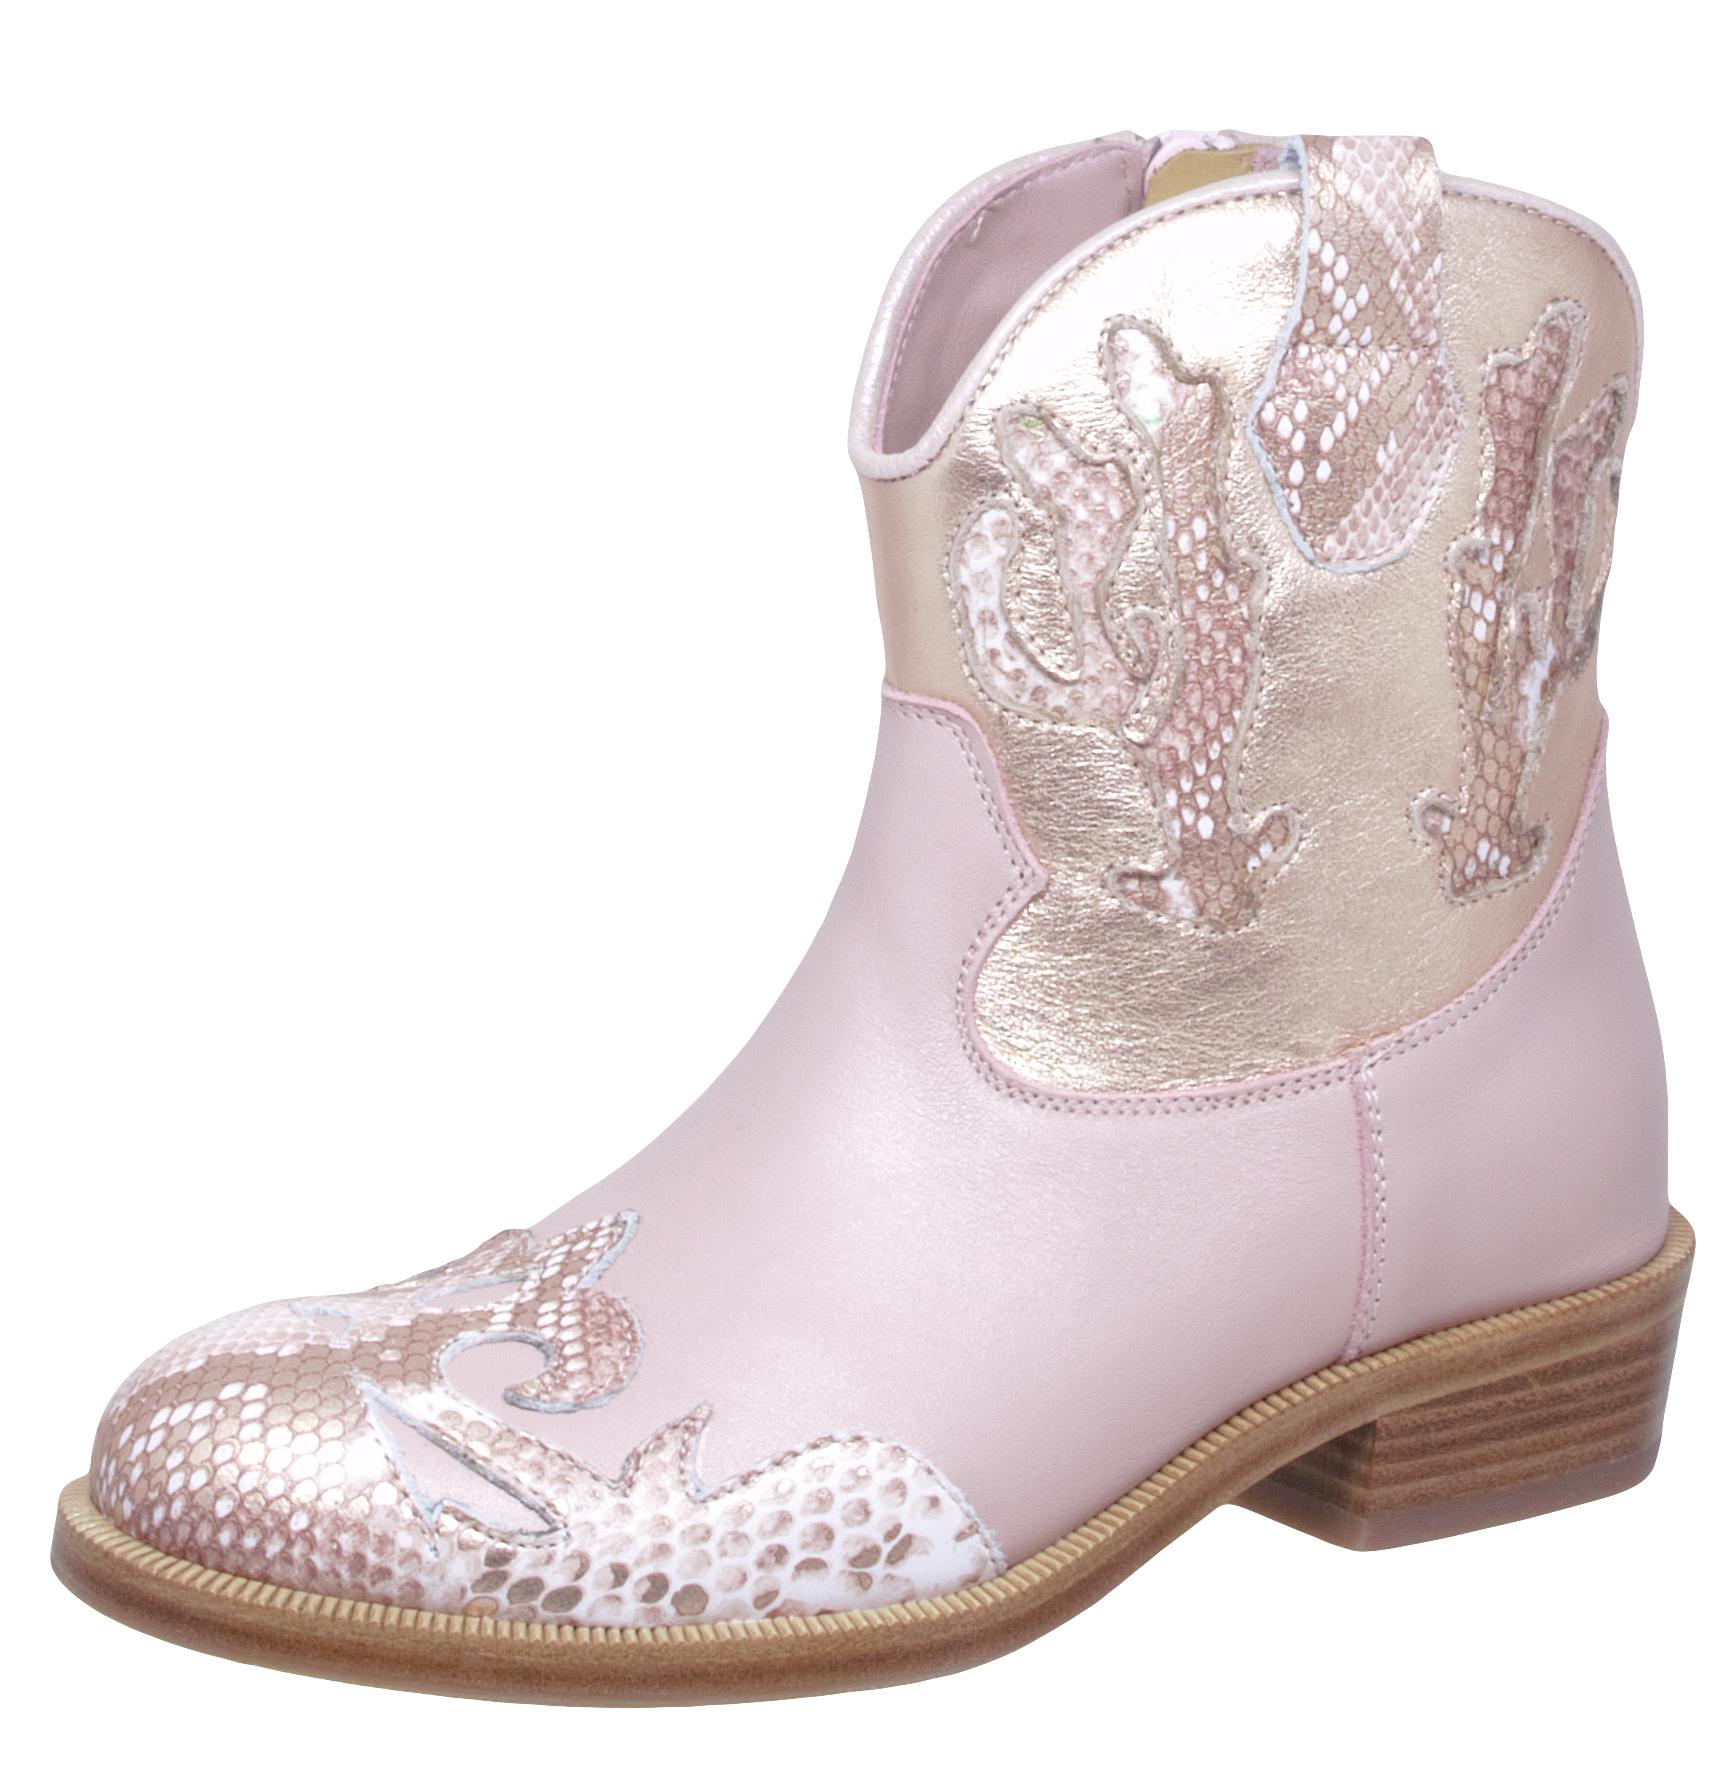 28-31 Neu Zecchino d/'Oro A06-668 Stiefeletten Boots Leder Sterne Rosa Gr